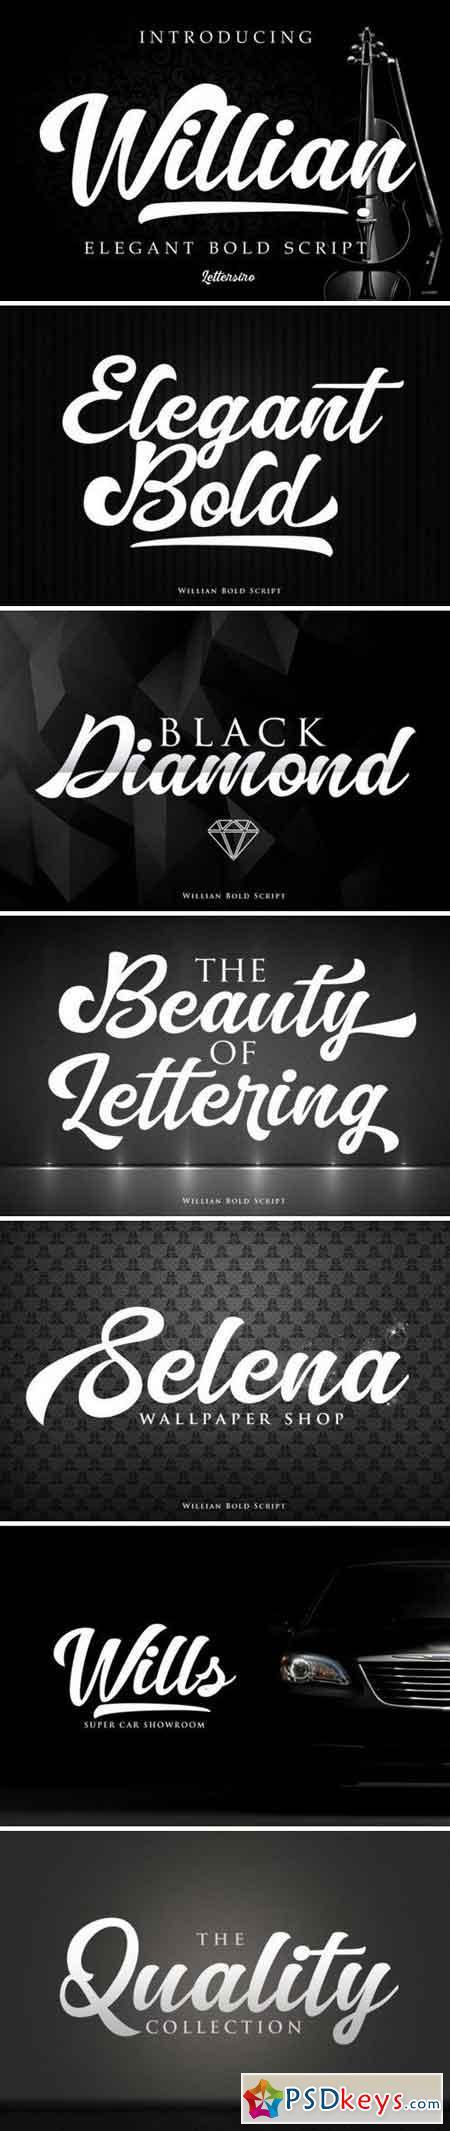 Willian - Elegant Bold Script 3384195